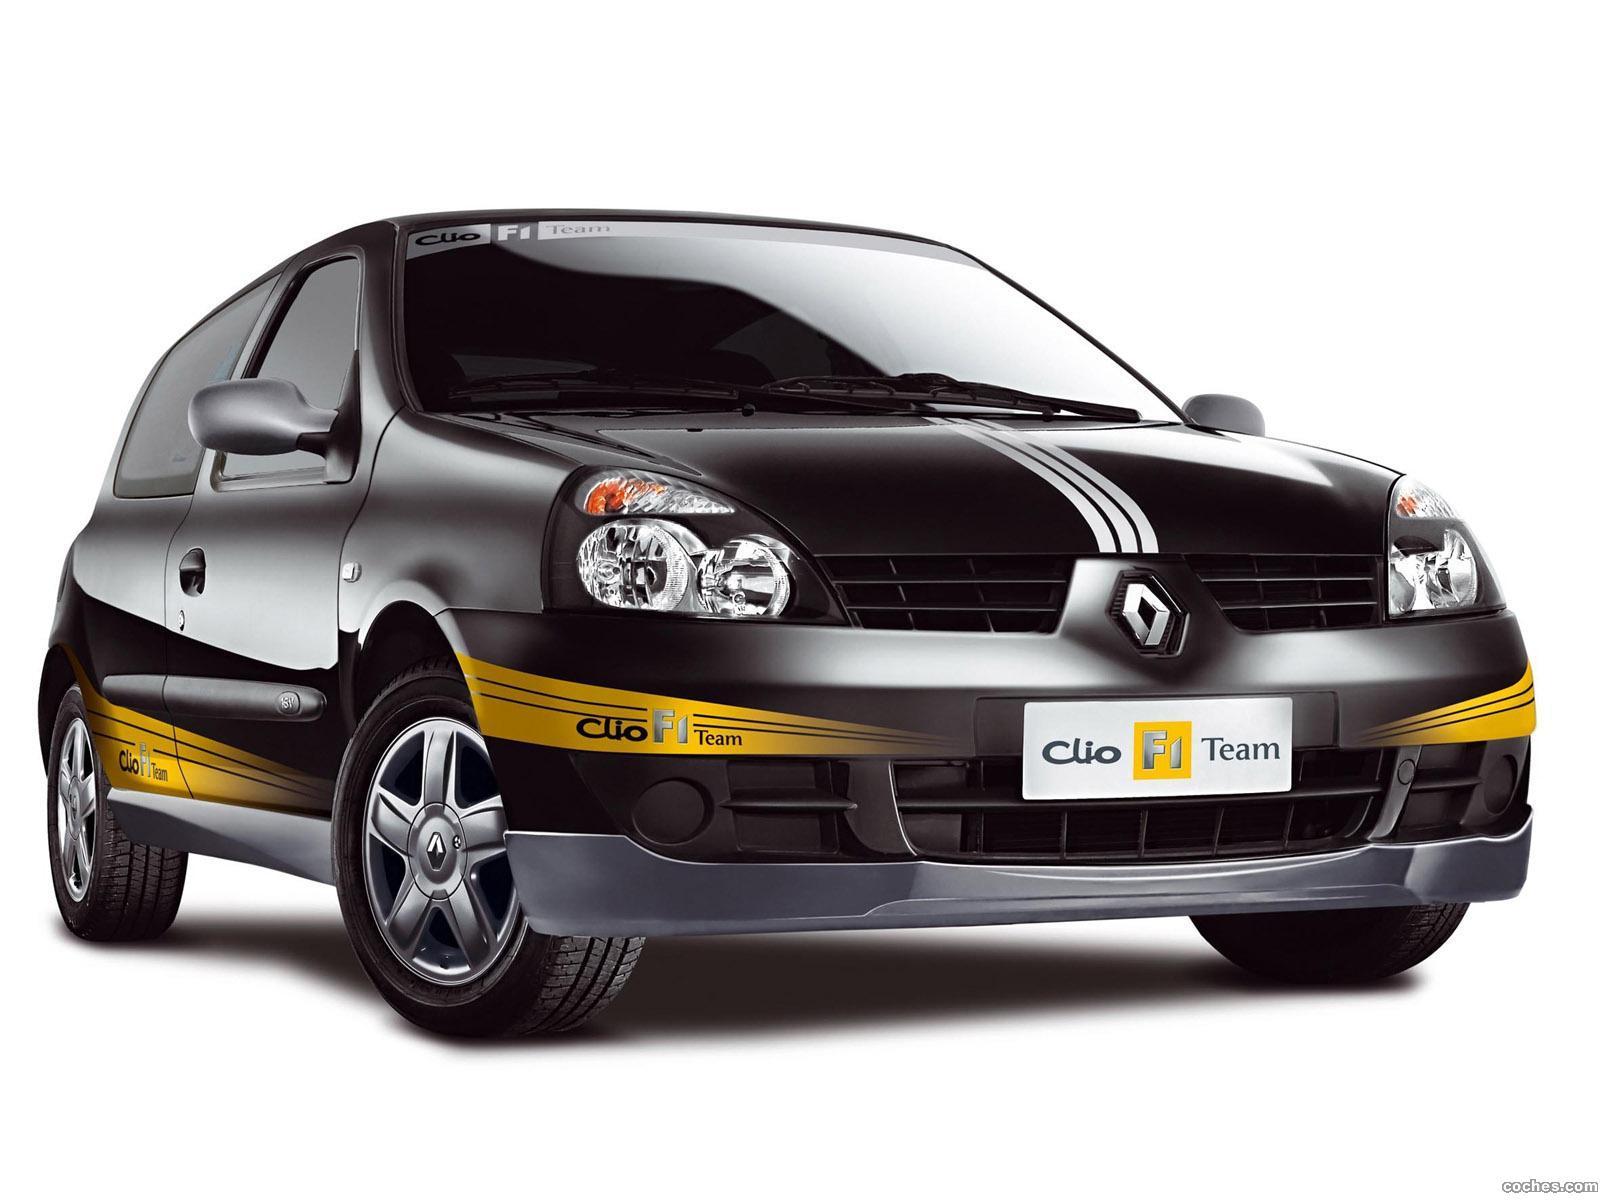 Foto 0 de Renault Clio F1 Team 2007